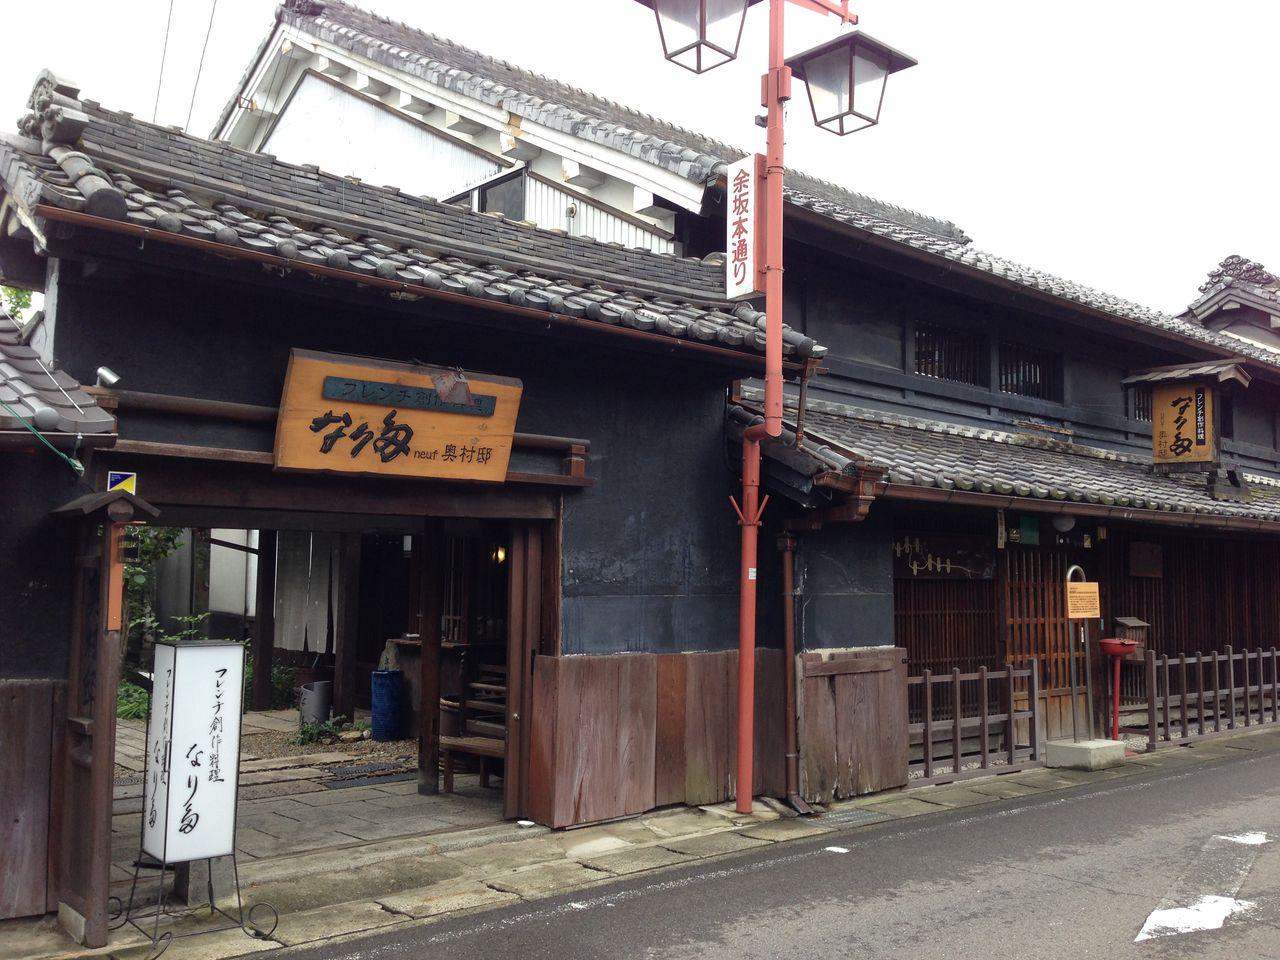 築山殿 - Lady TsukiyamaForgot Password